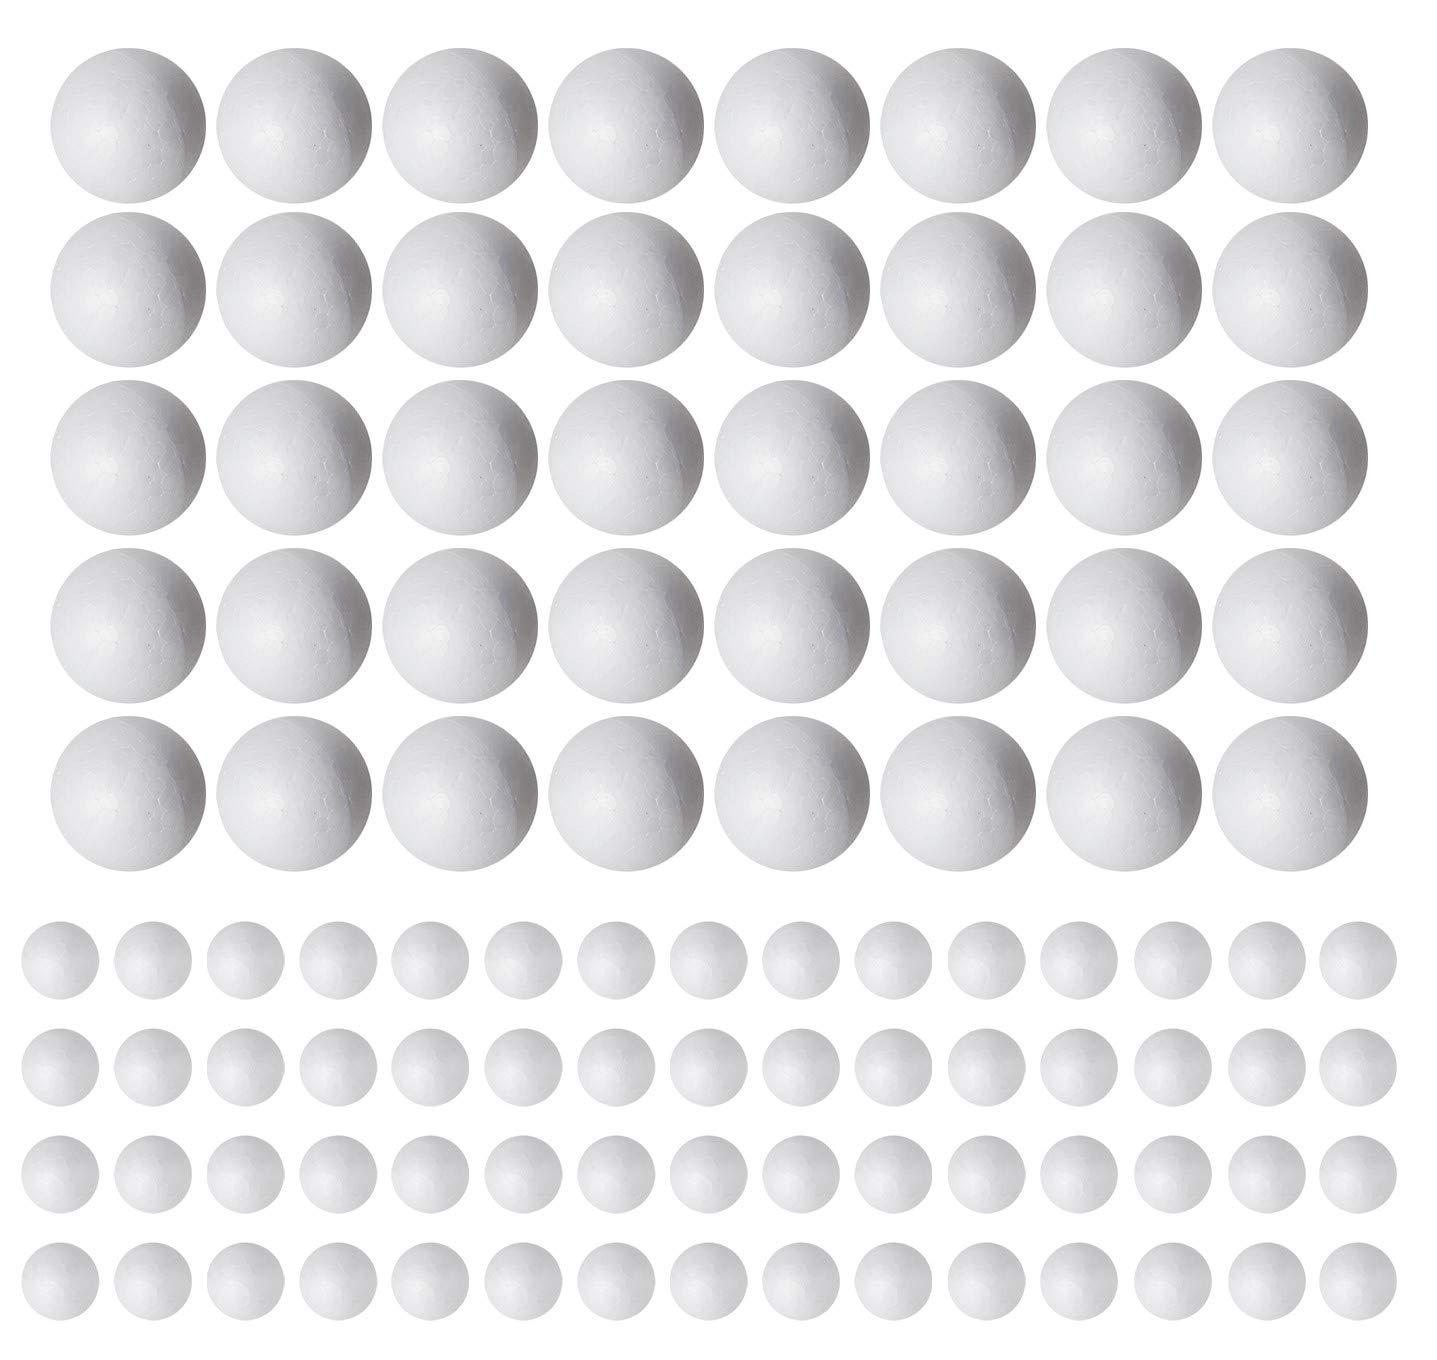 100 Pack Styrofoam Balls (40 Piece 2'' Inch, 60 Piece 1'' Inch) -Foam Balls- Foam Craft Balls - Foam Balls für Arts und Crafts- Floral Foam Balls- Bulk Styrofoam Balls-1 & 2 Zoll Foam Balls (100 Pack)